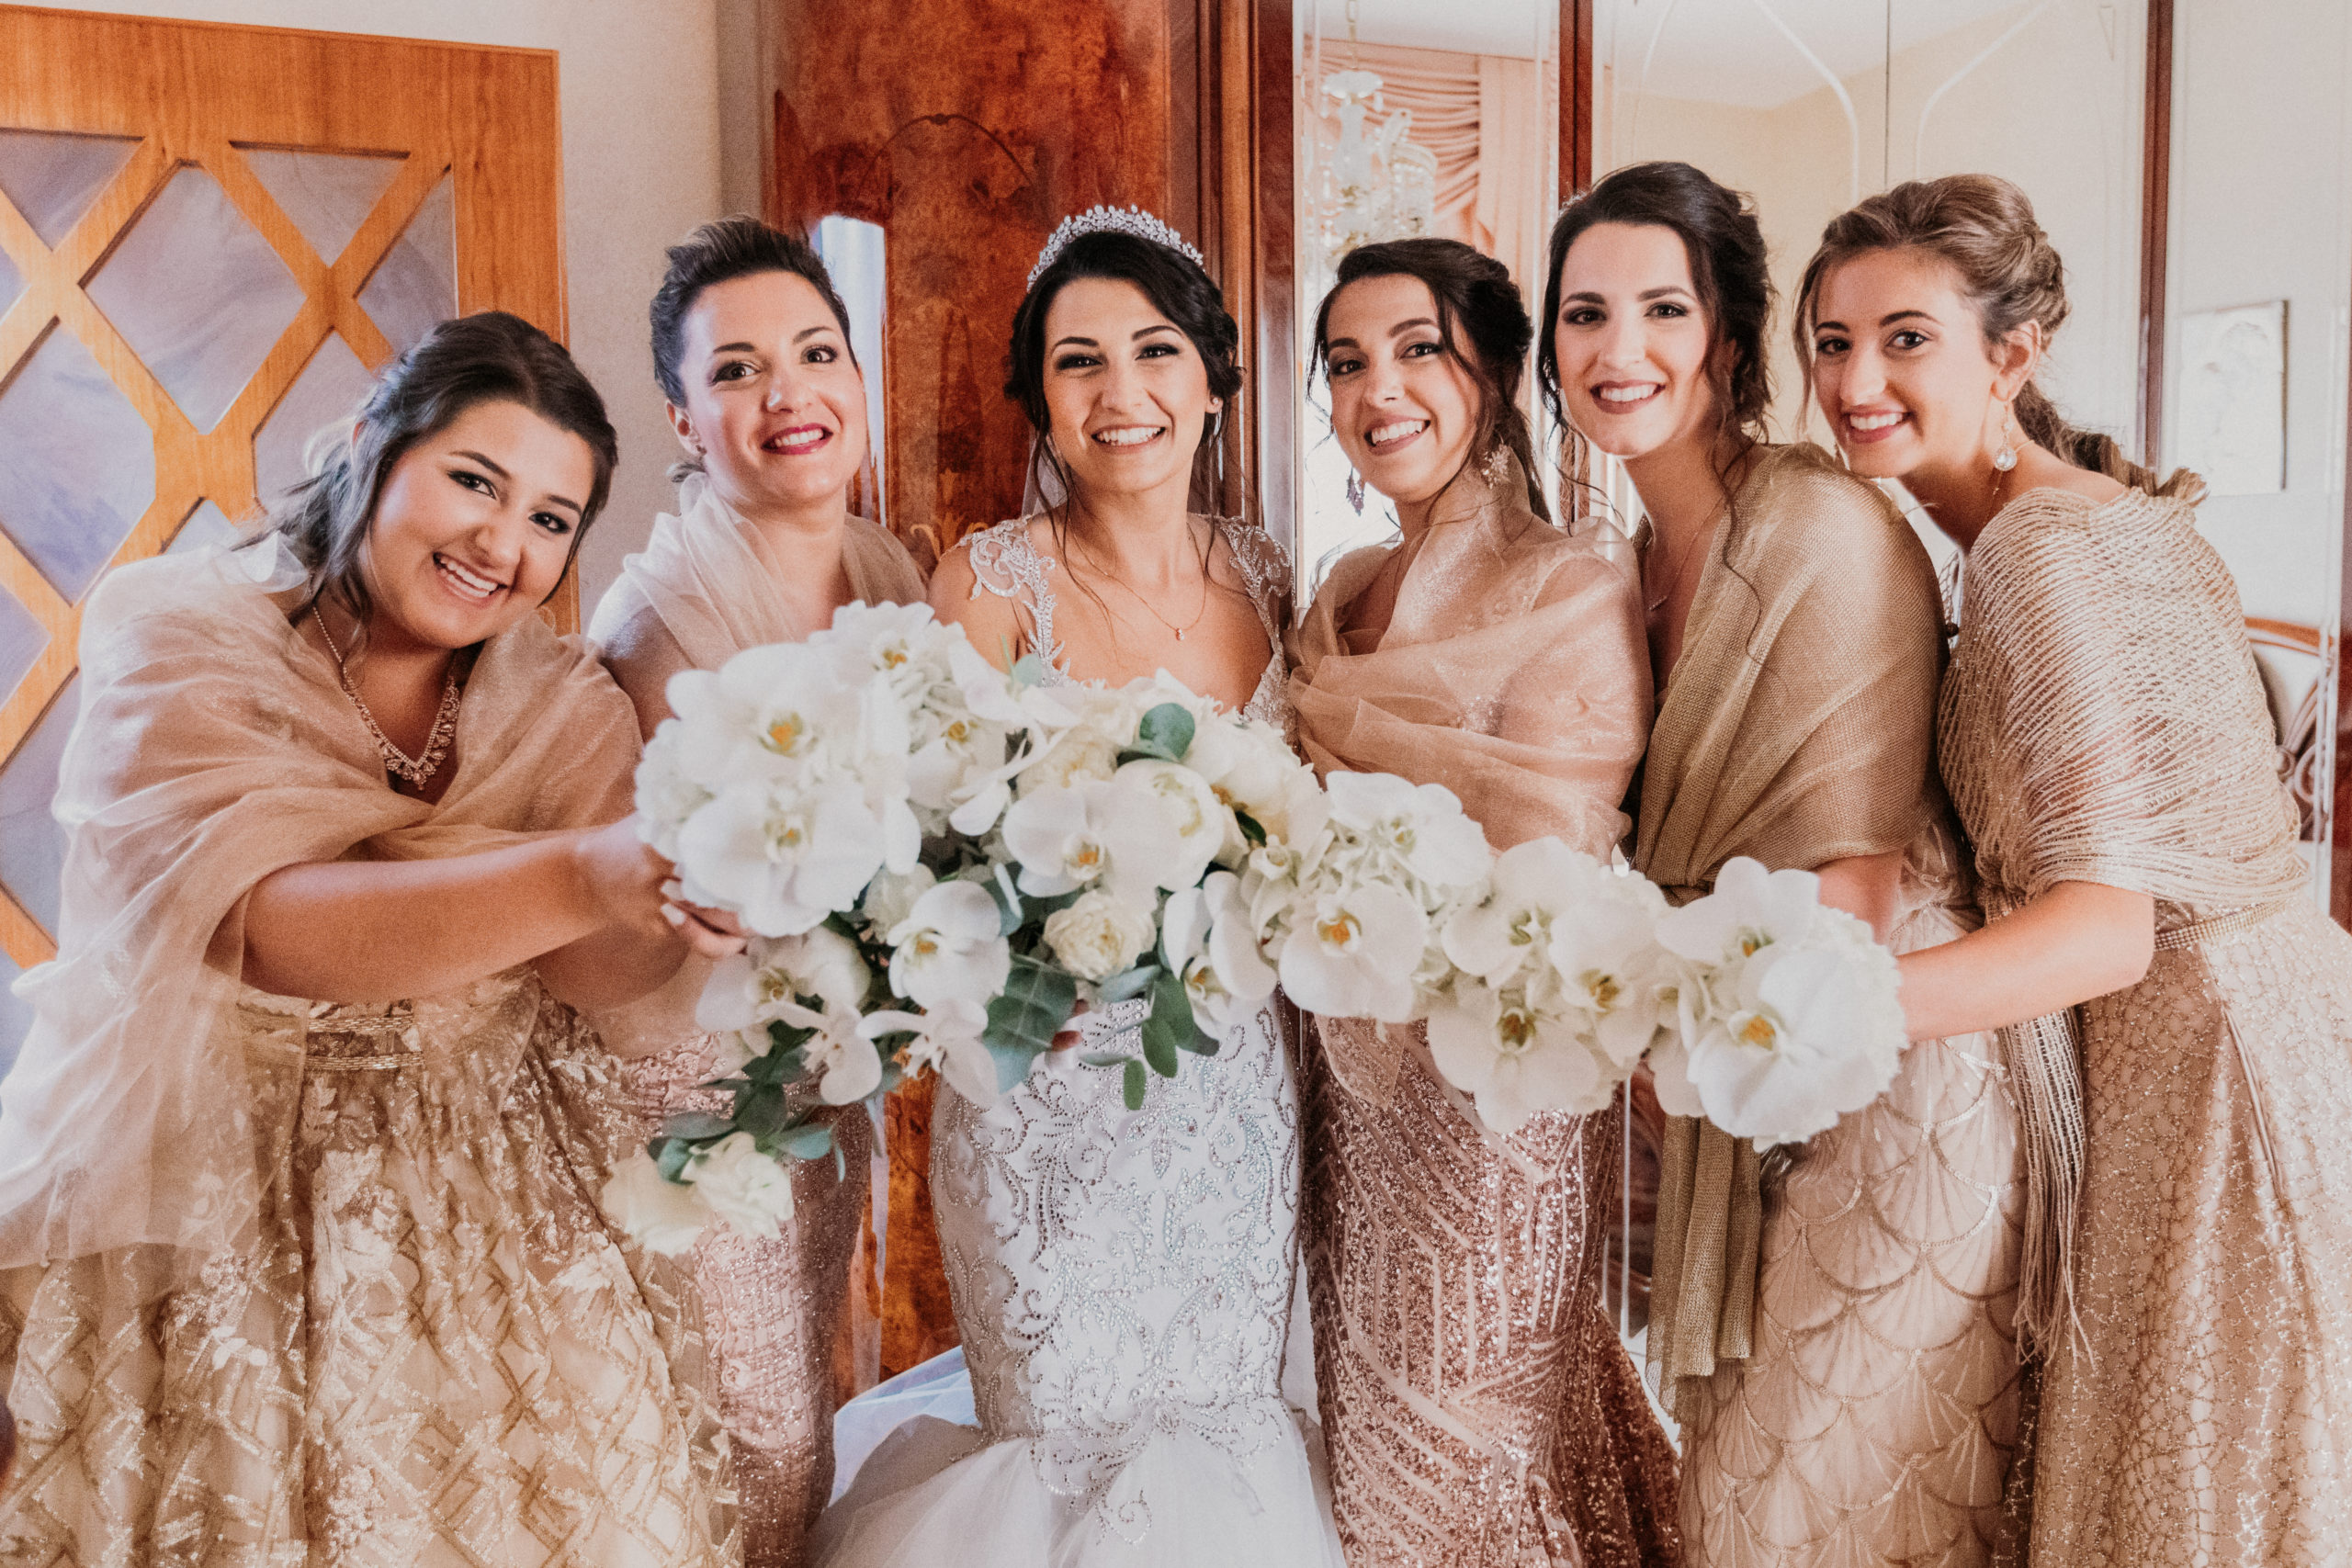 fotografo matrimonio napoli offerte